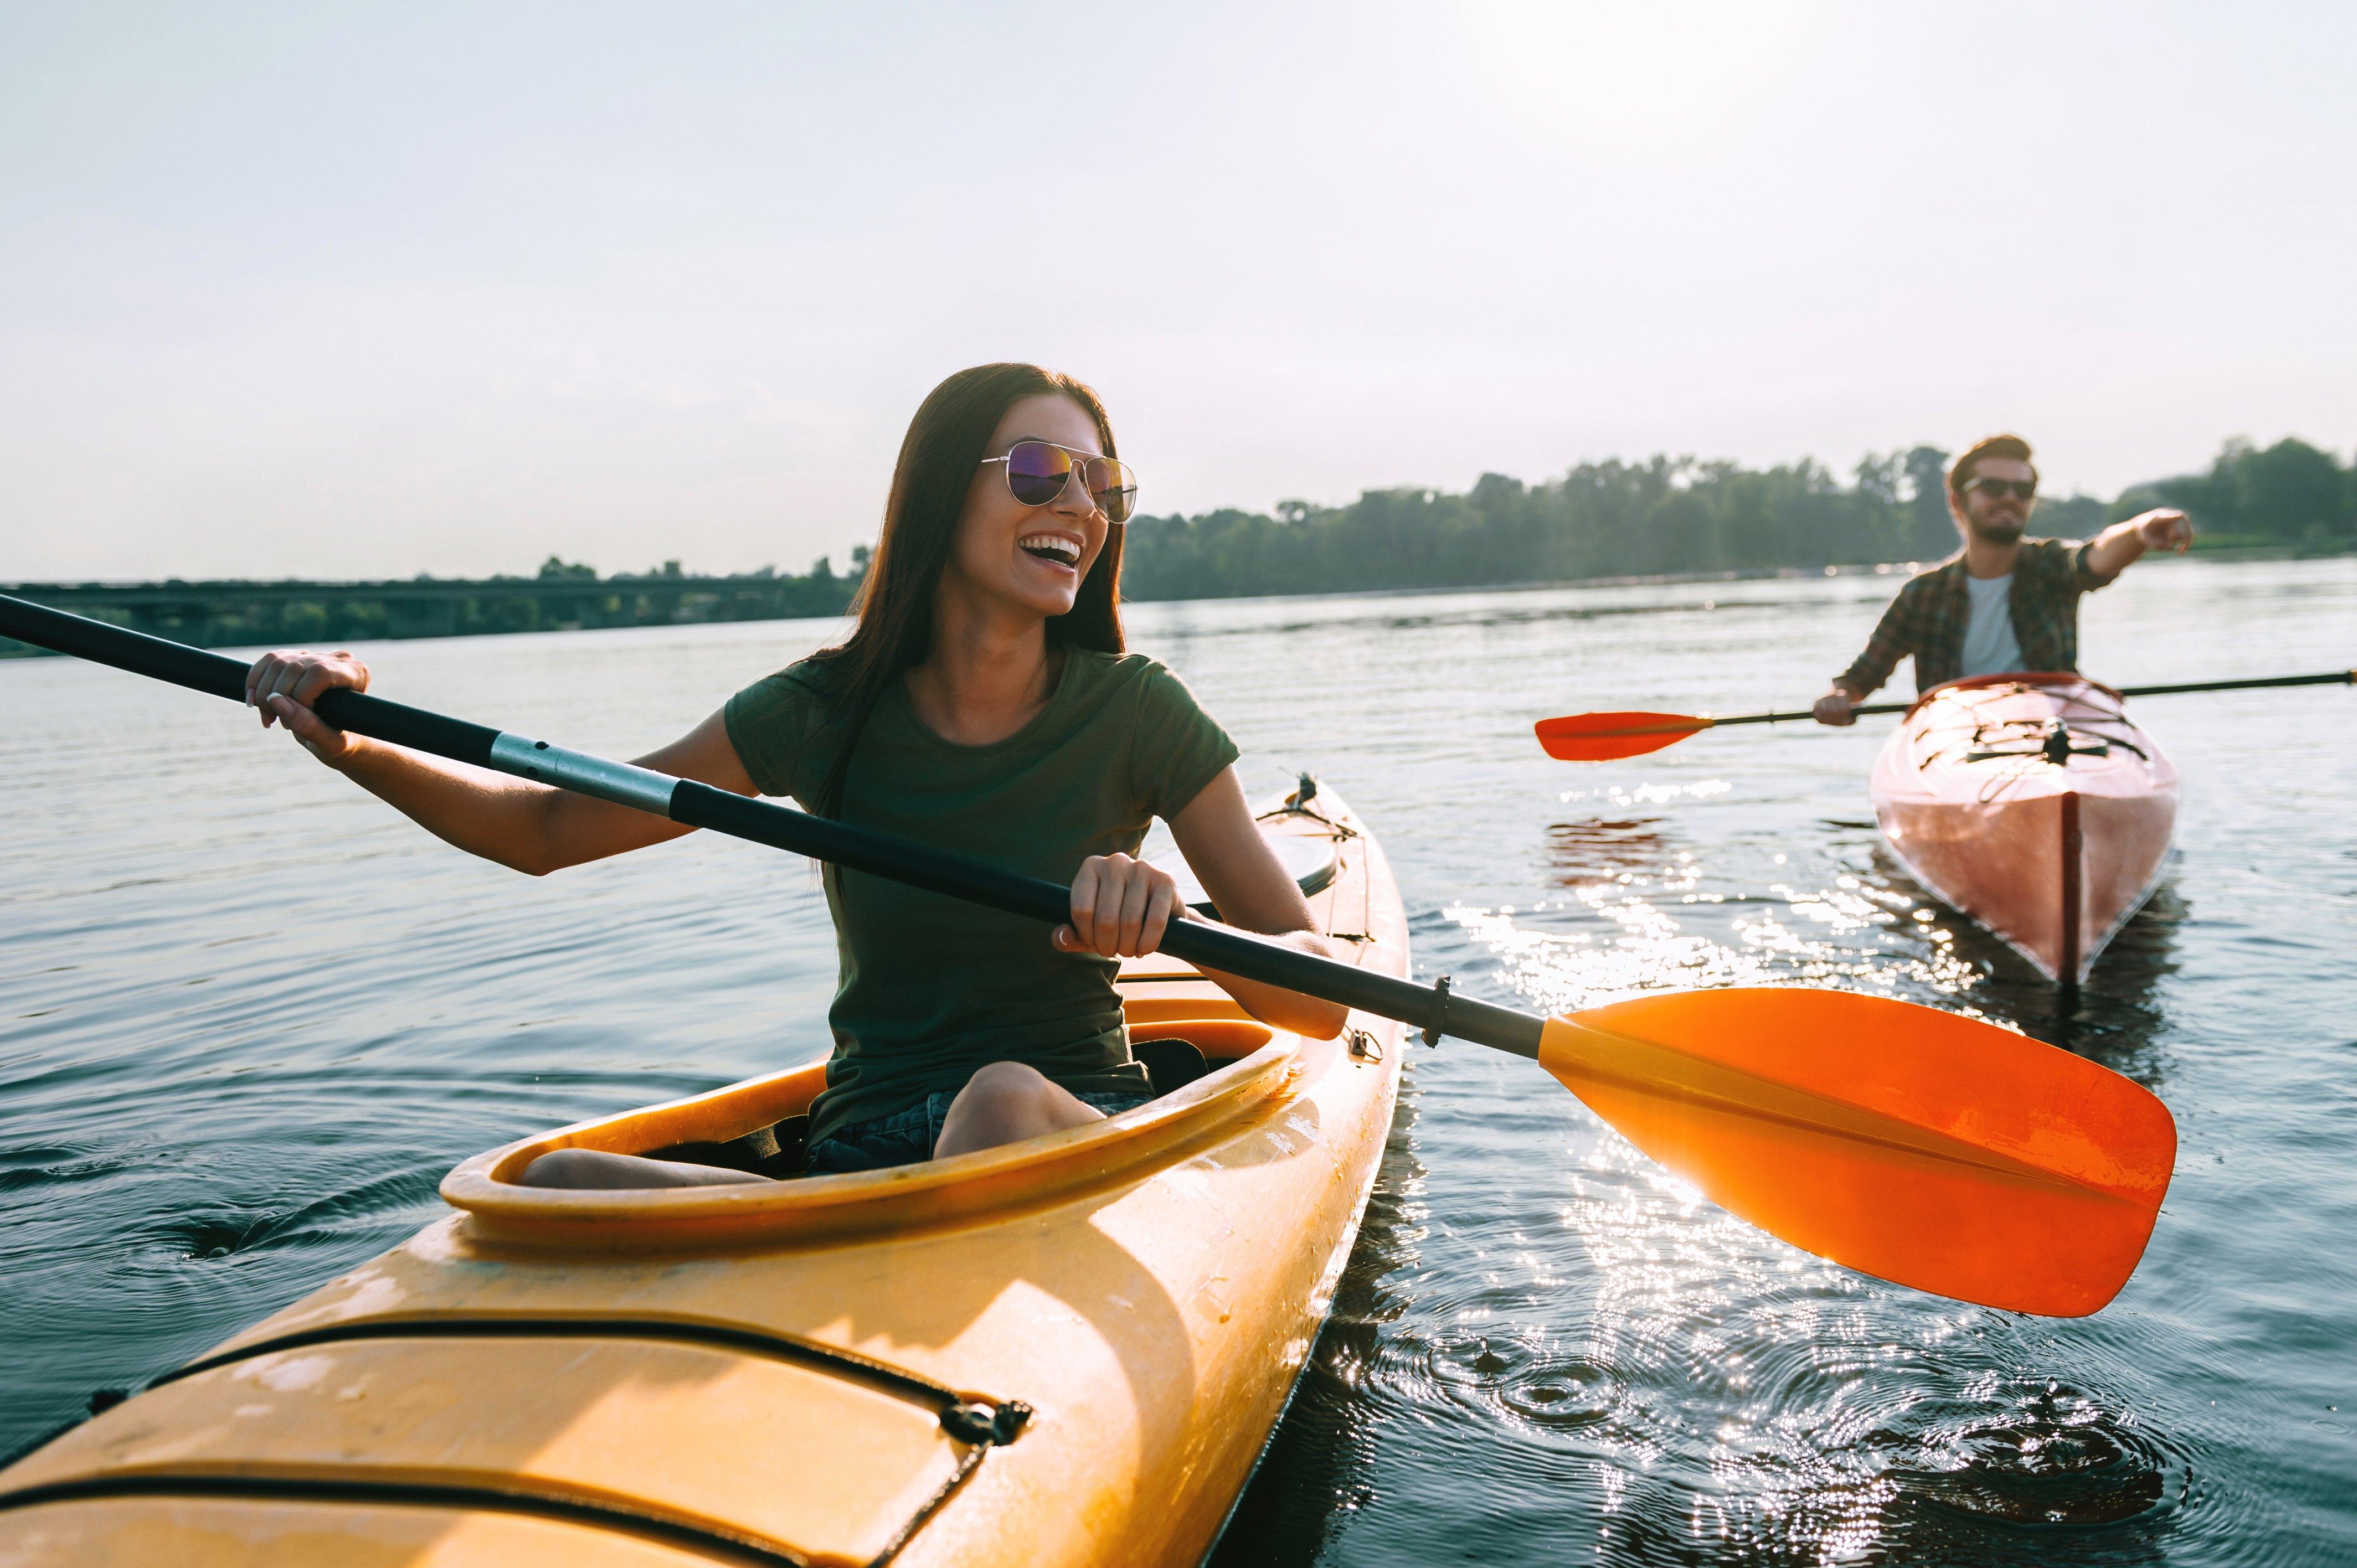 7 Fun Summer Activities That Burn the Most Calories